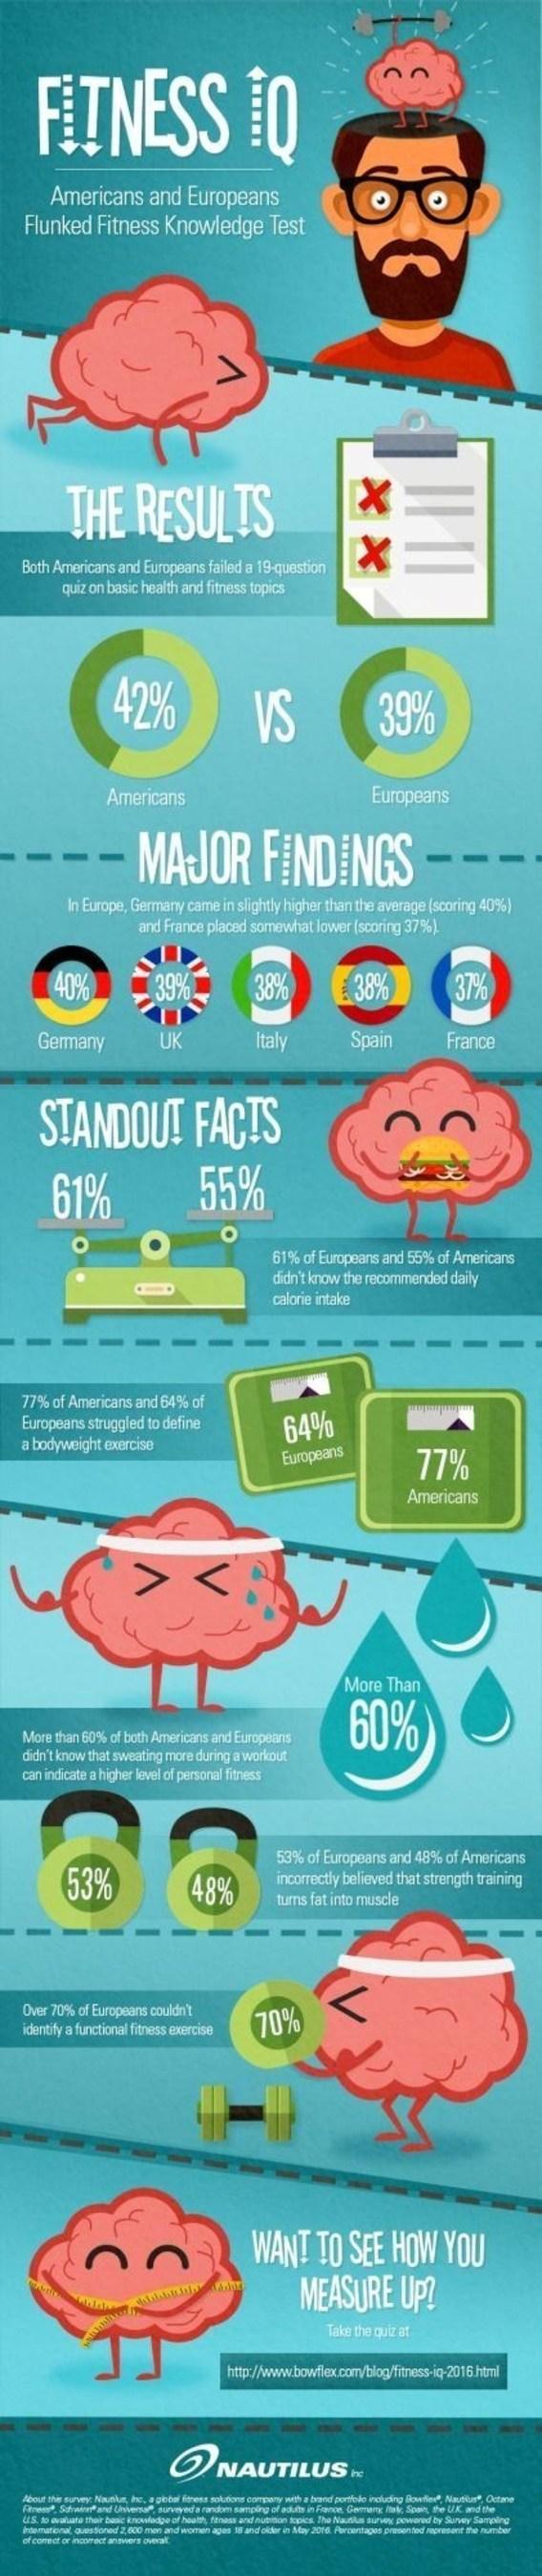 Americans and Europeans Flunk Fitness Test (PRNewsFoto/Nautilus, Inc.)